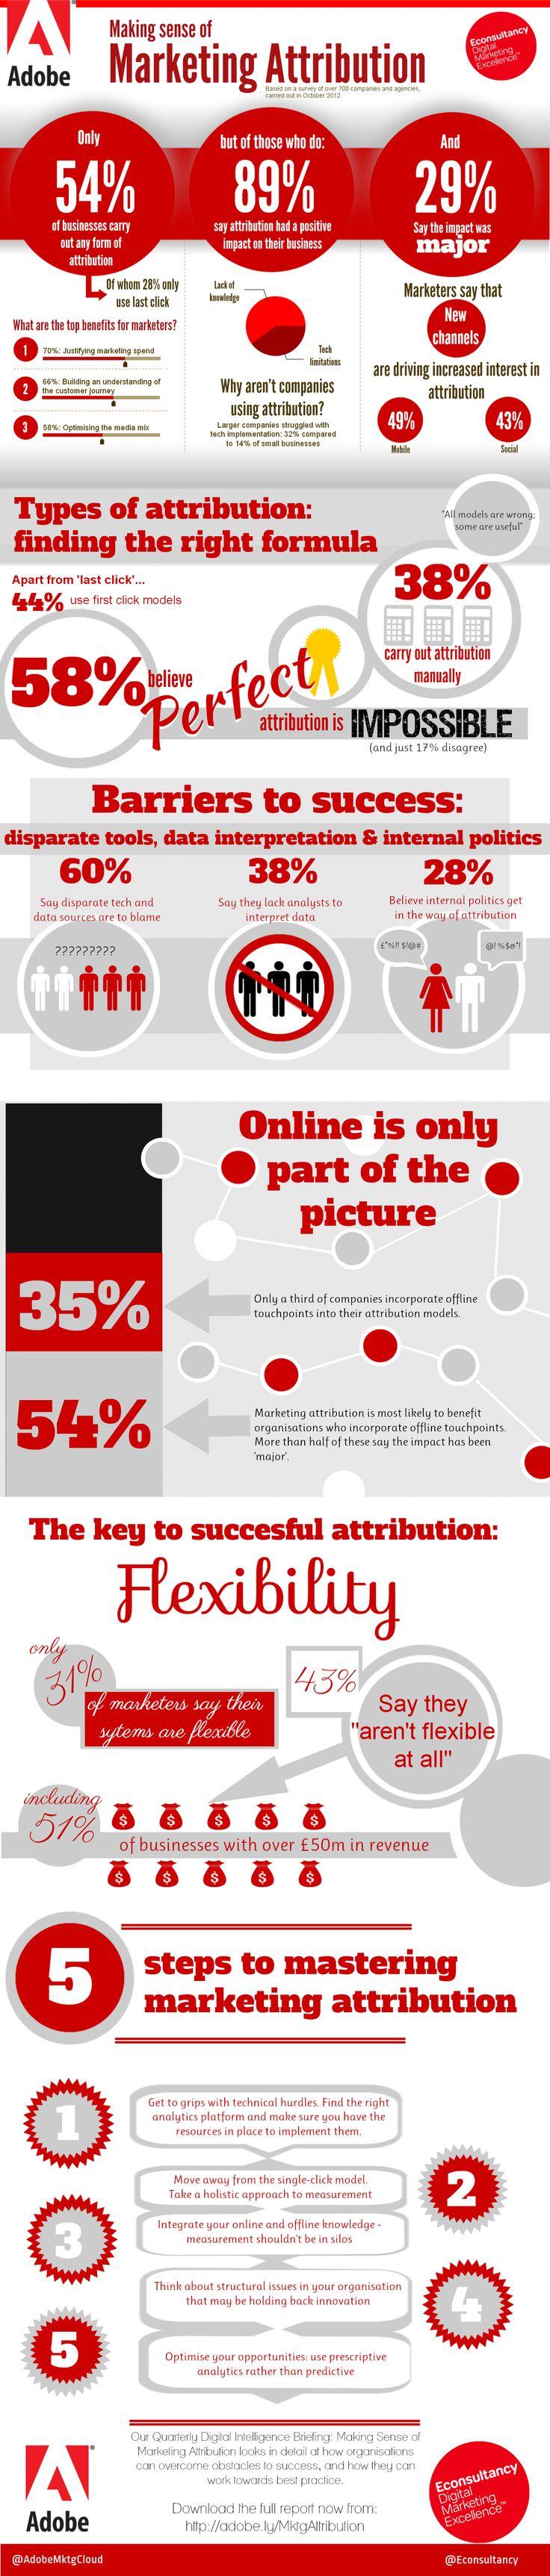 Adobe: Making Sense of Marketing Attribution [Infographic]